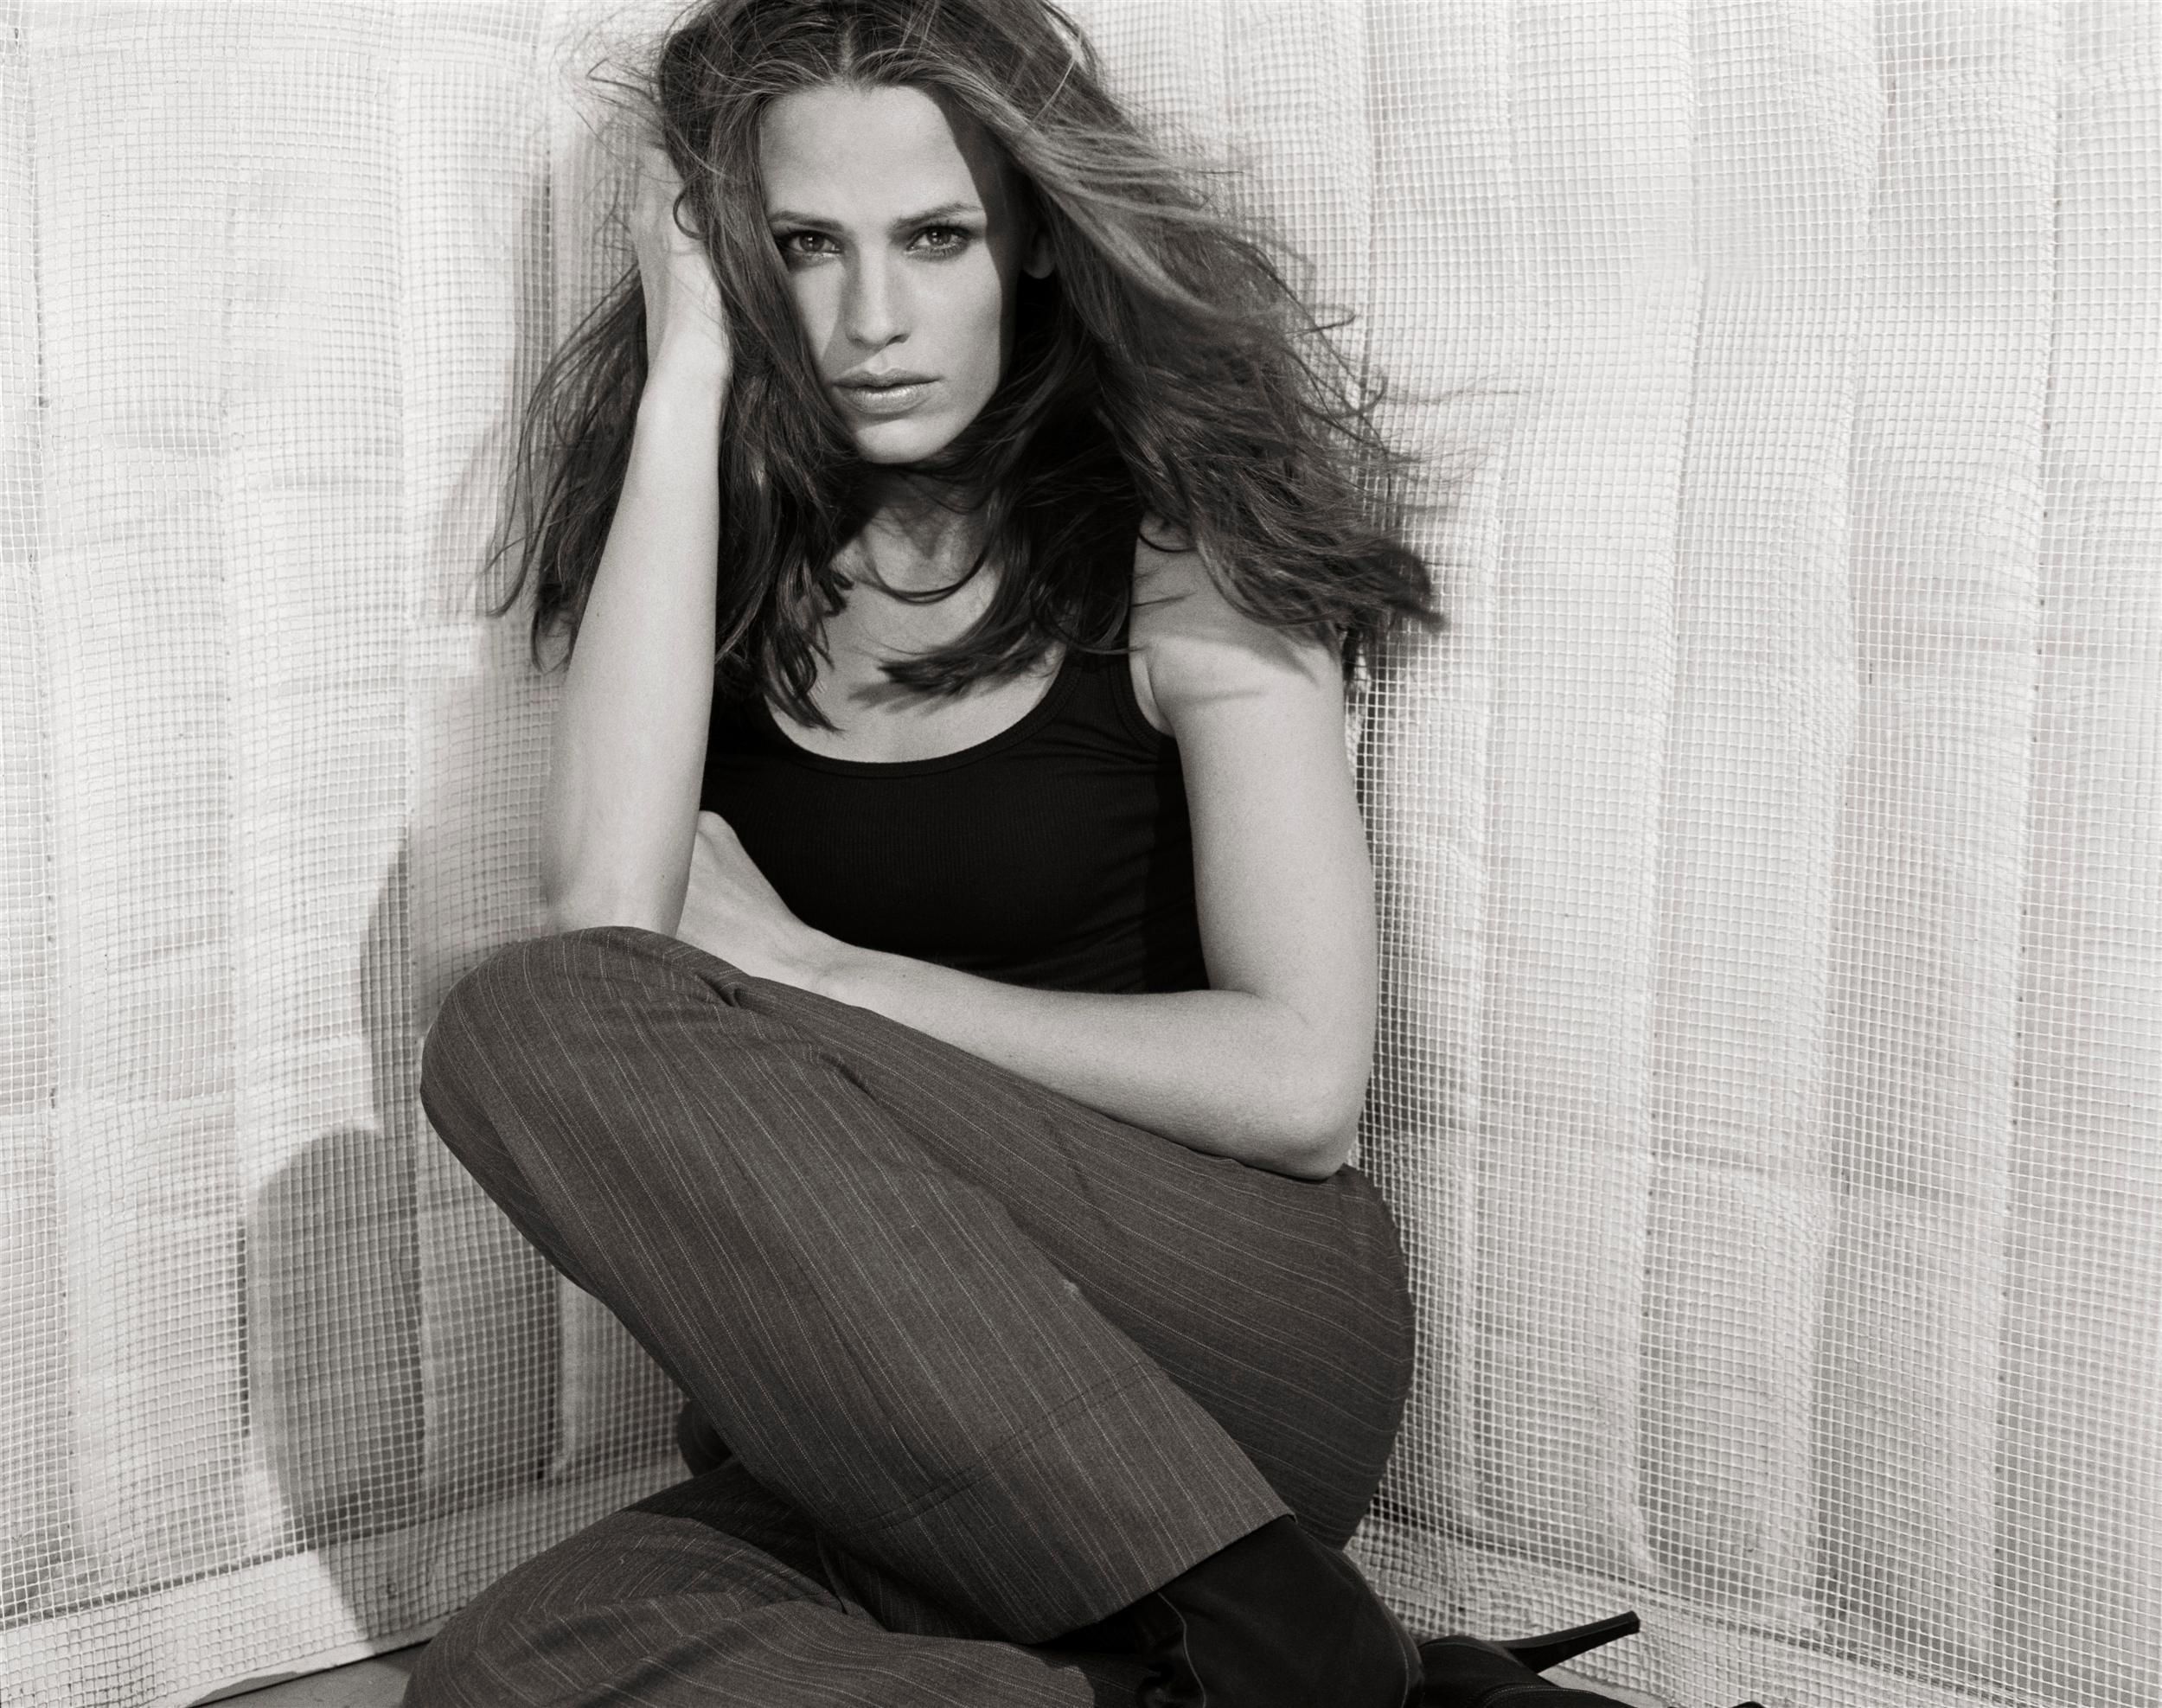 Jennifer Garner, Sexy Wallpapers HD / Desktop and Mobile